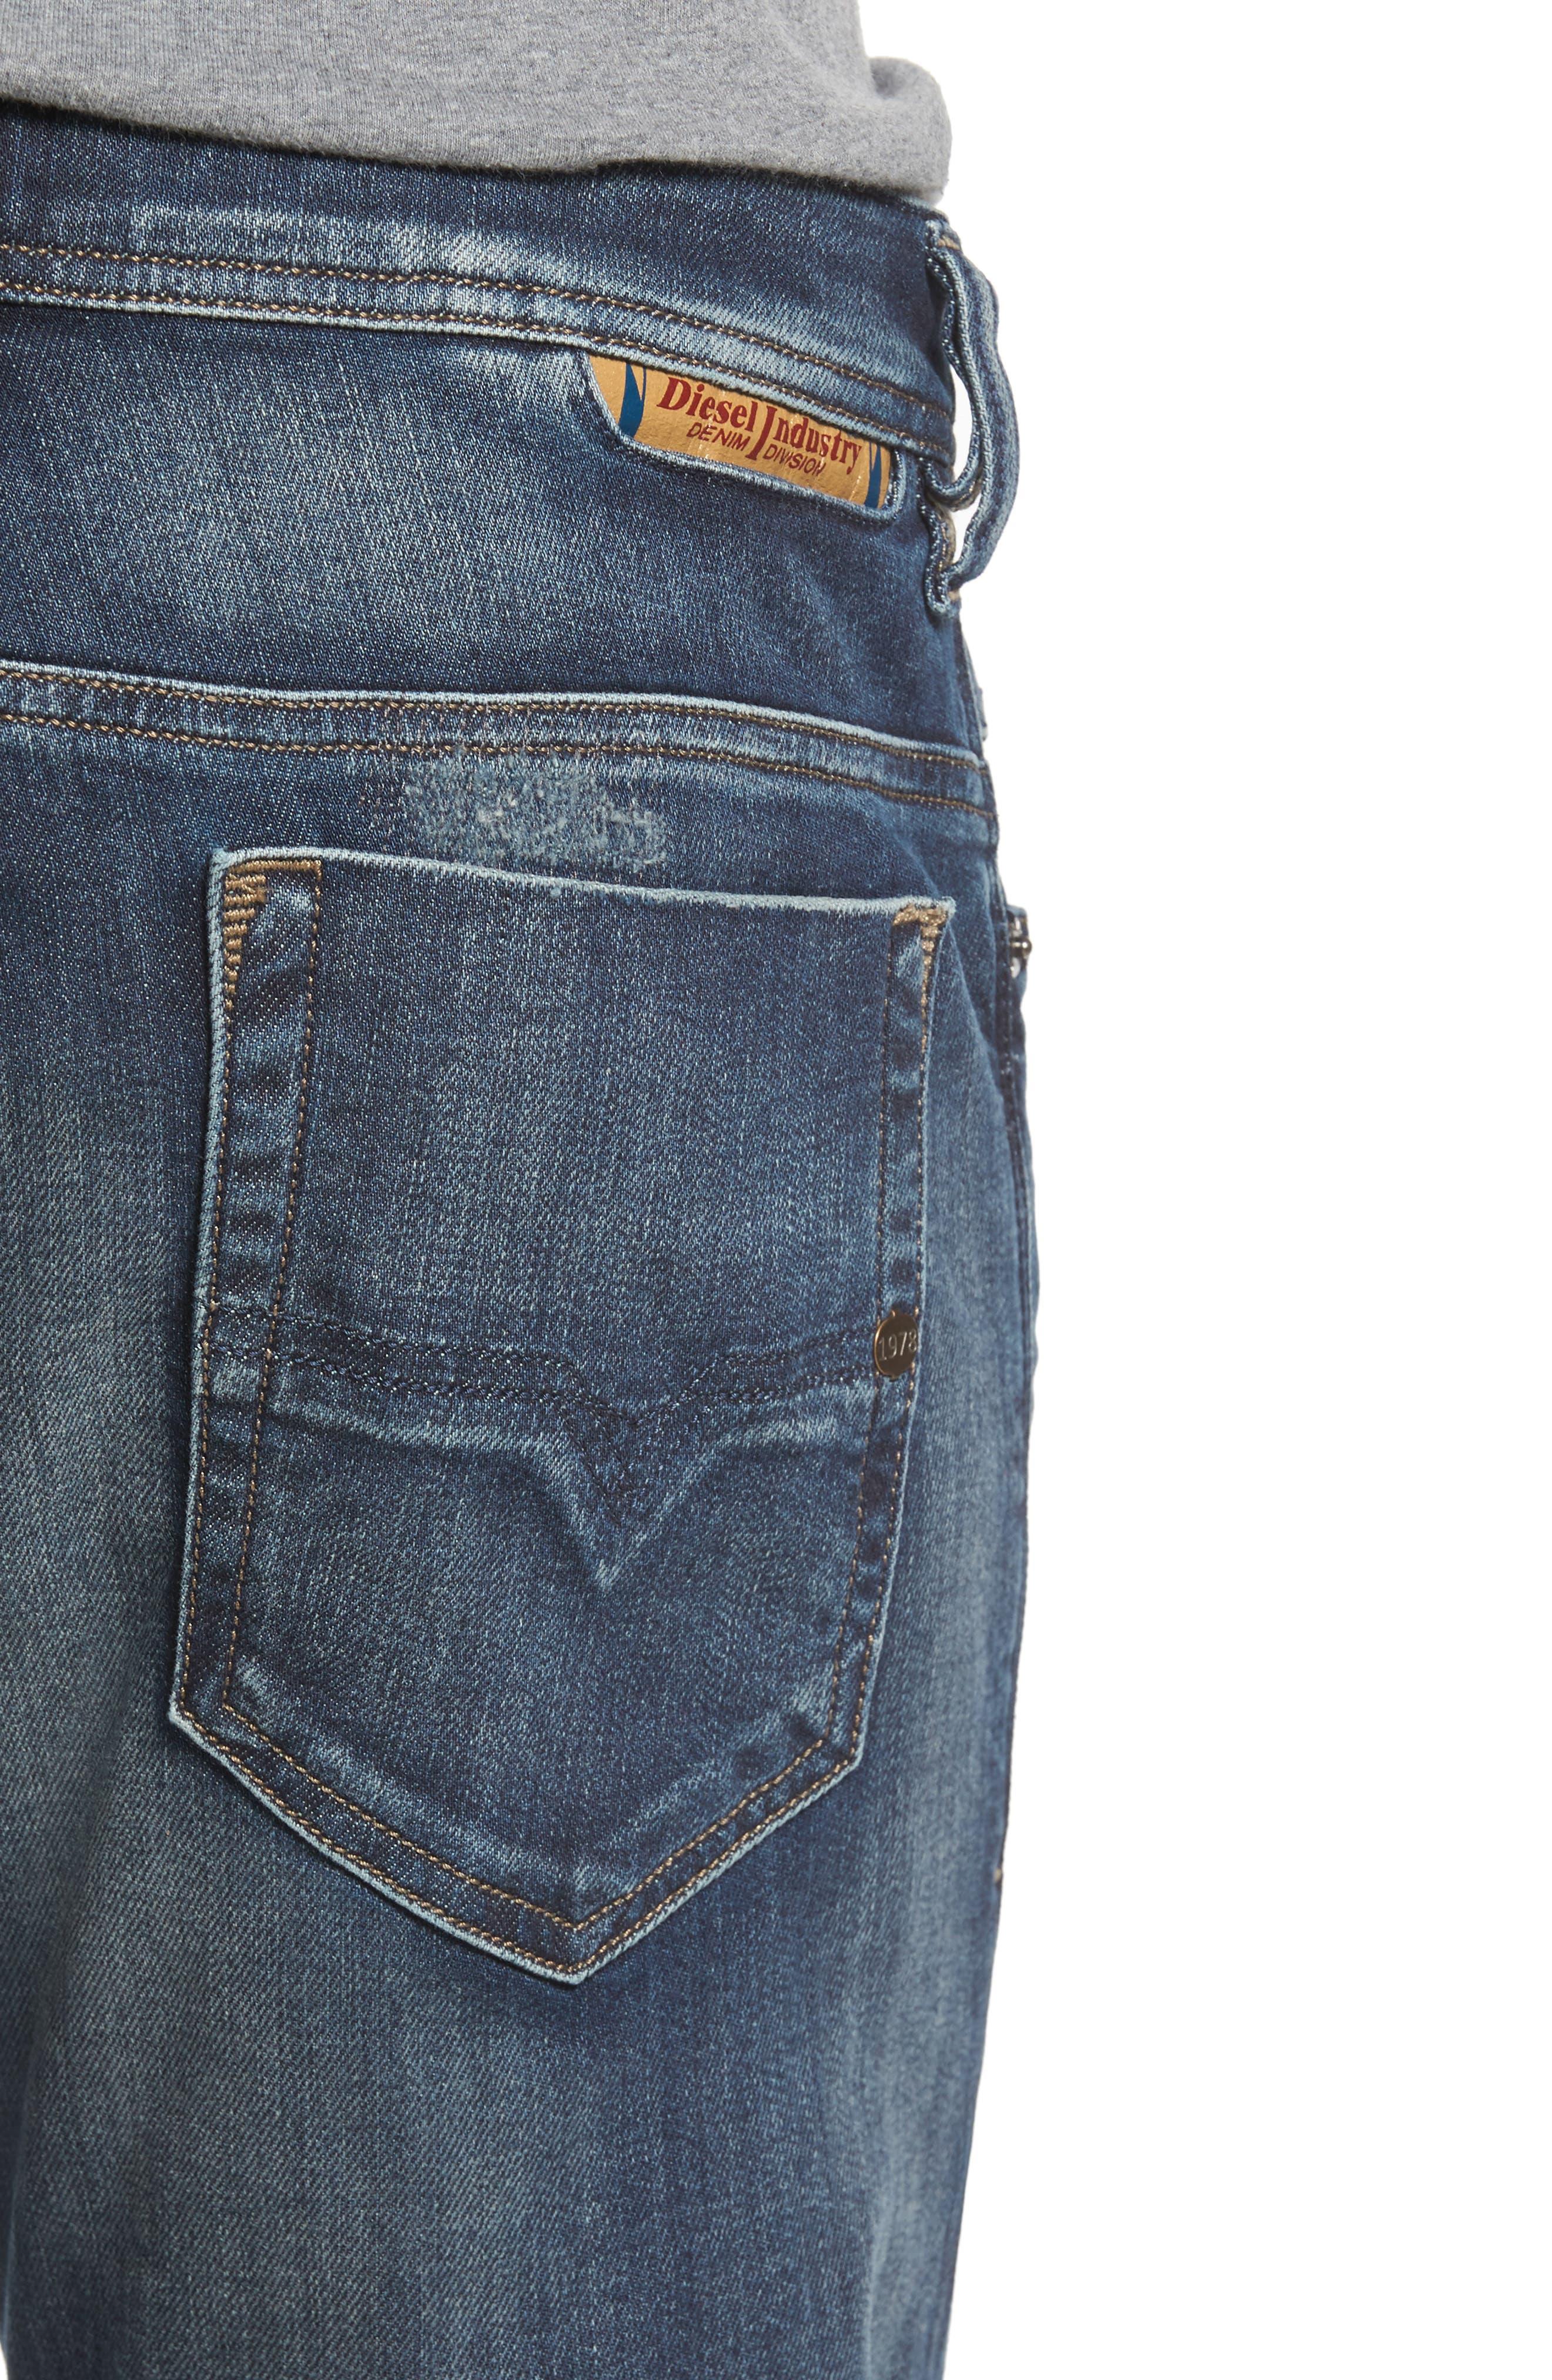 Safado Slim Straight Fit Jeans,                             Alternate thumbnail 4, color,                             860K